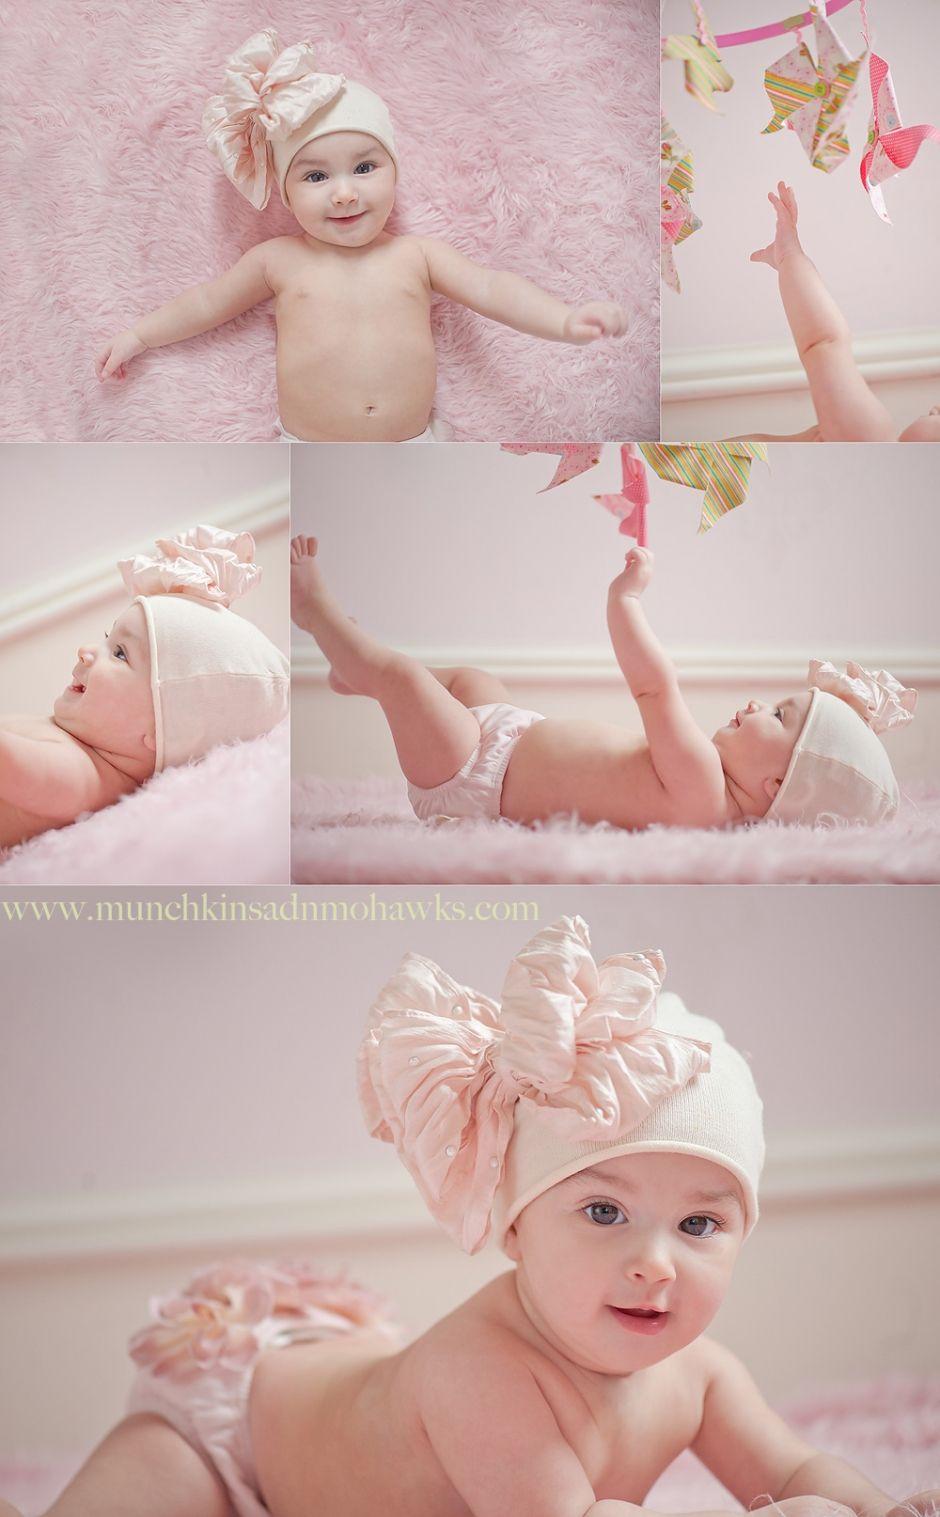 glamorous | Children photography, Baby photoshoot, Cute ...